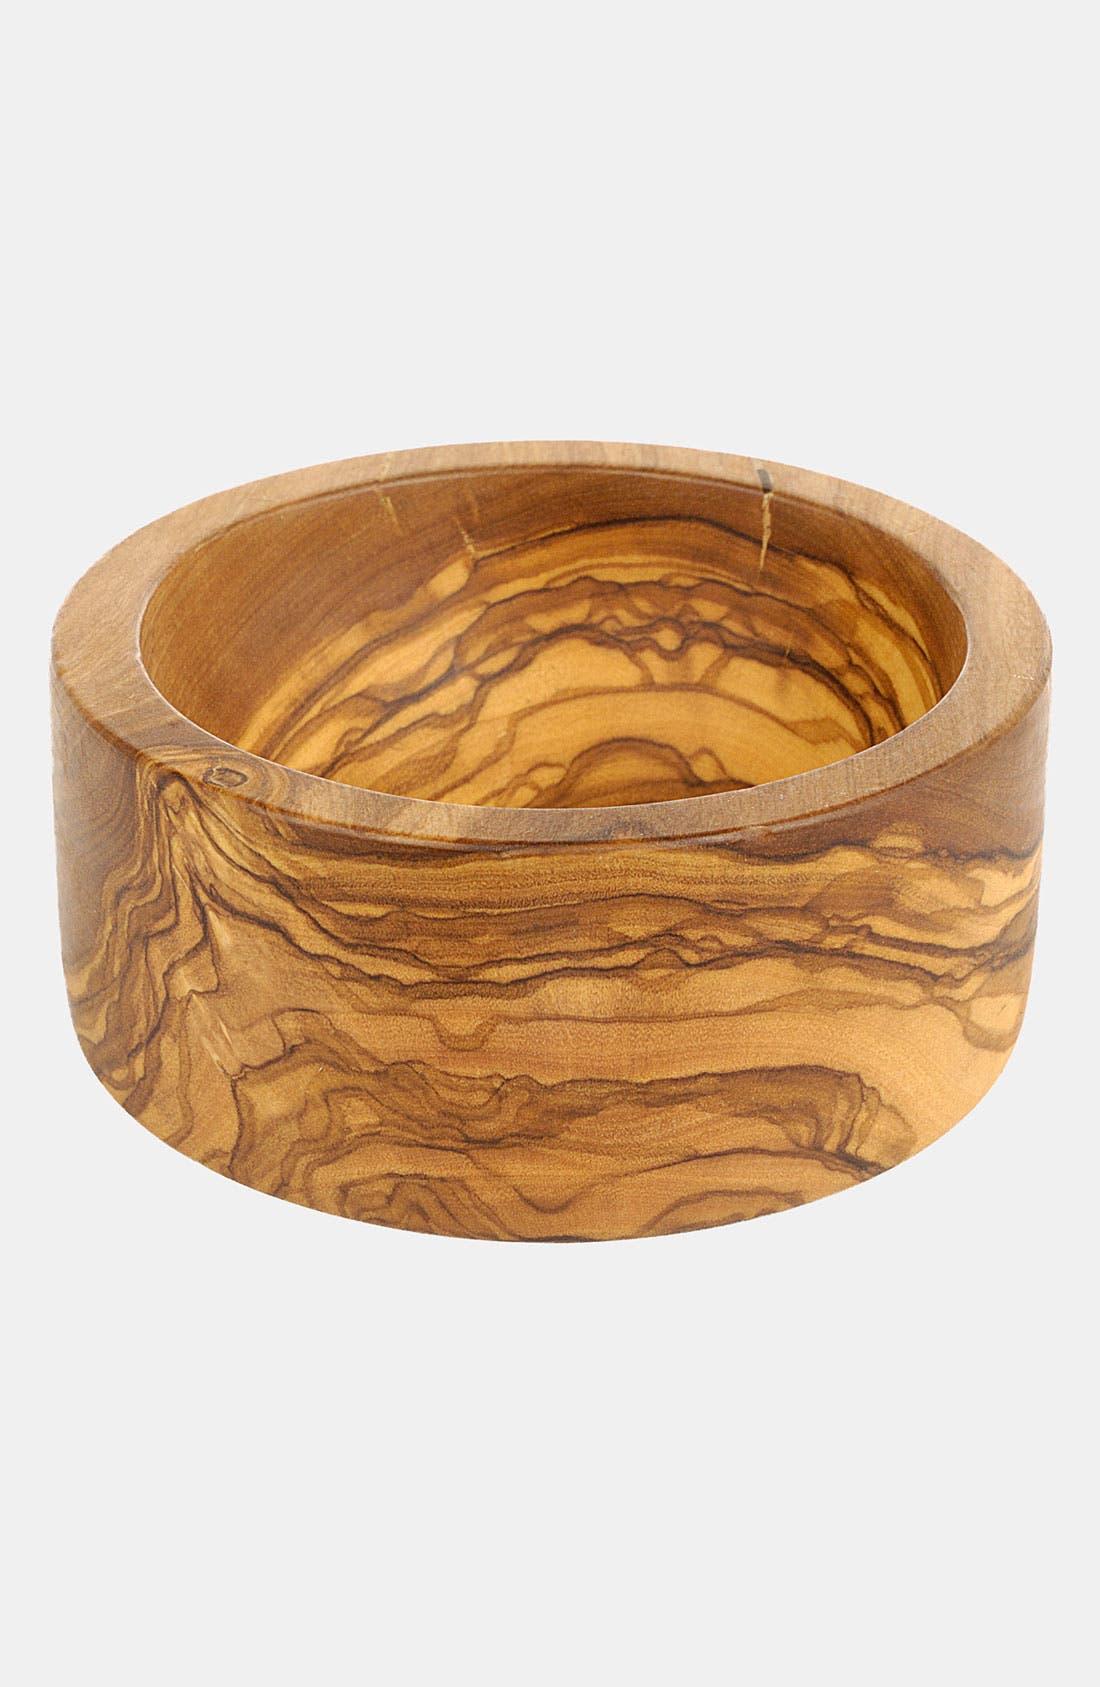 Alternate Image 1 Selected - Bérard Olive Wood Pitch Bowl